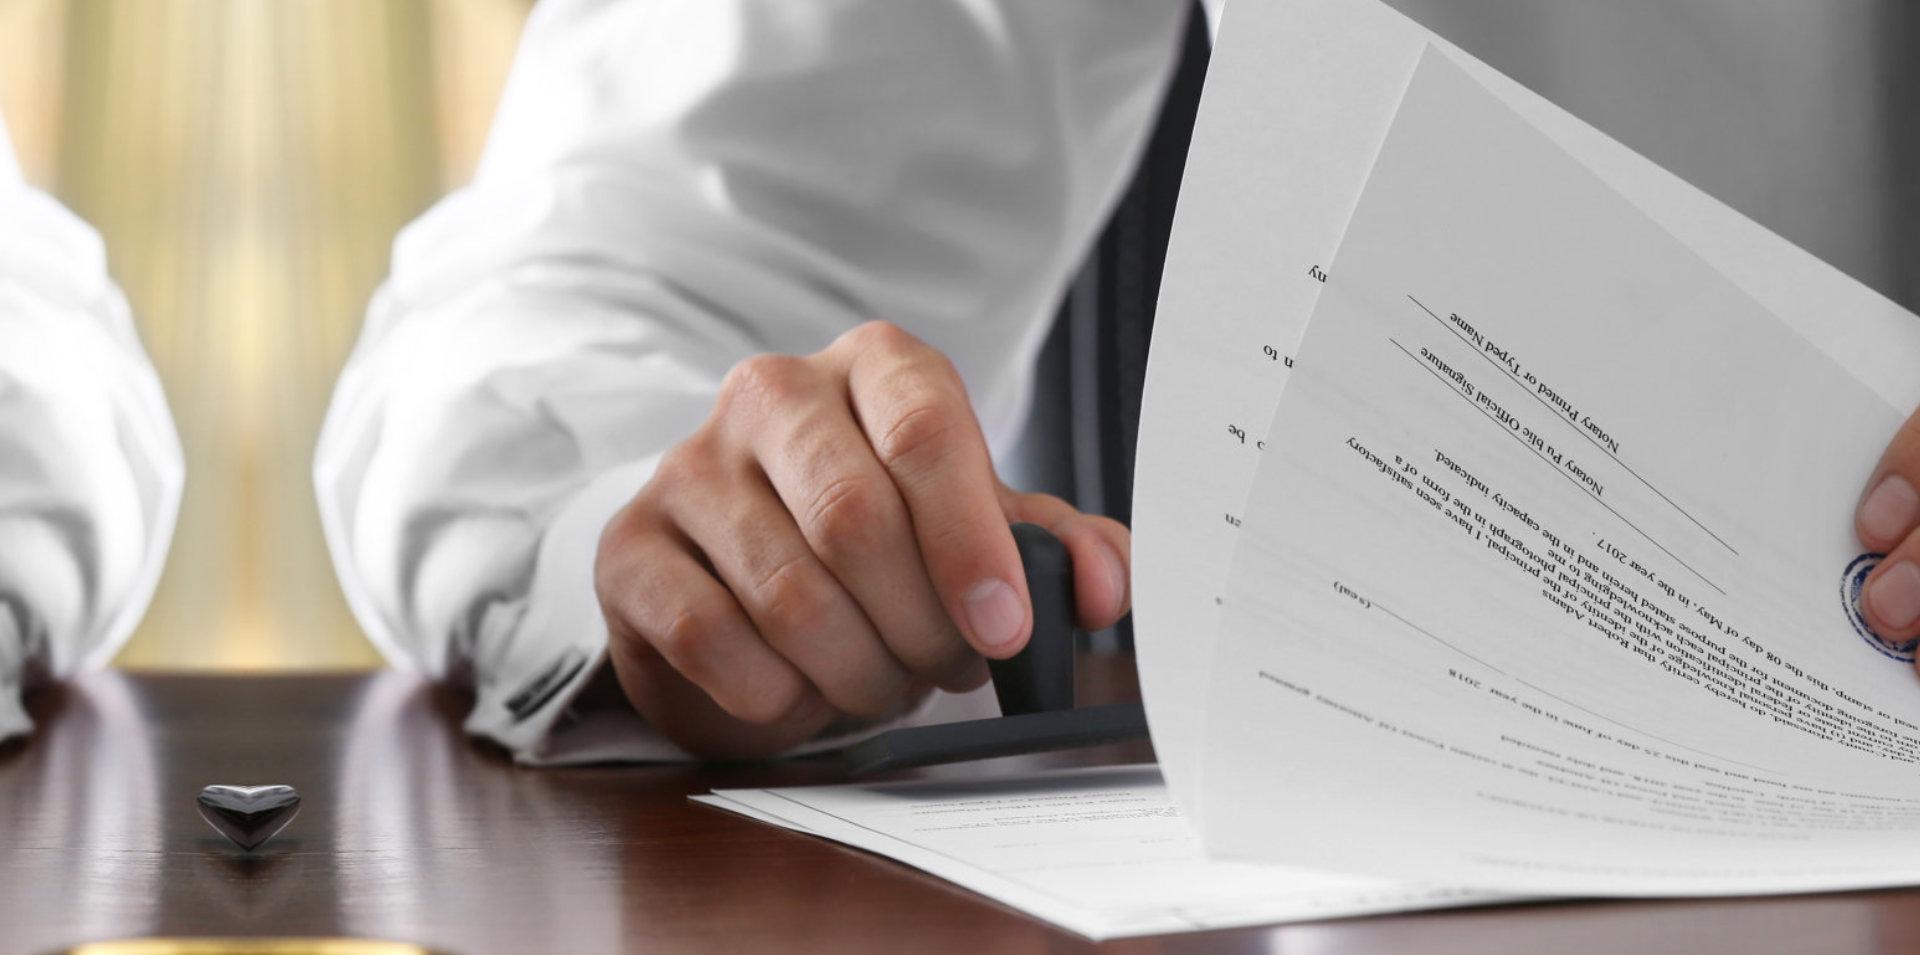 document review concept